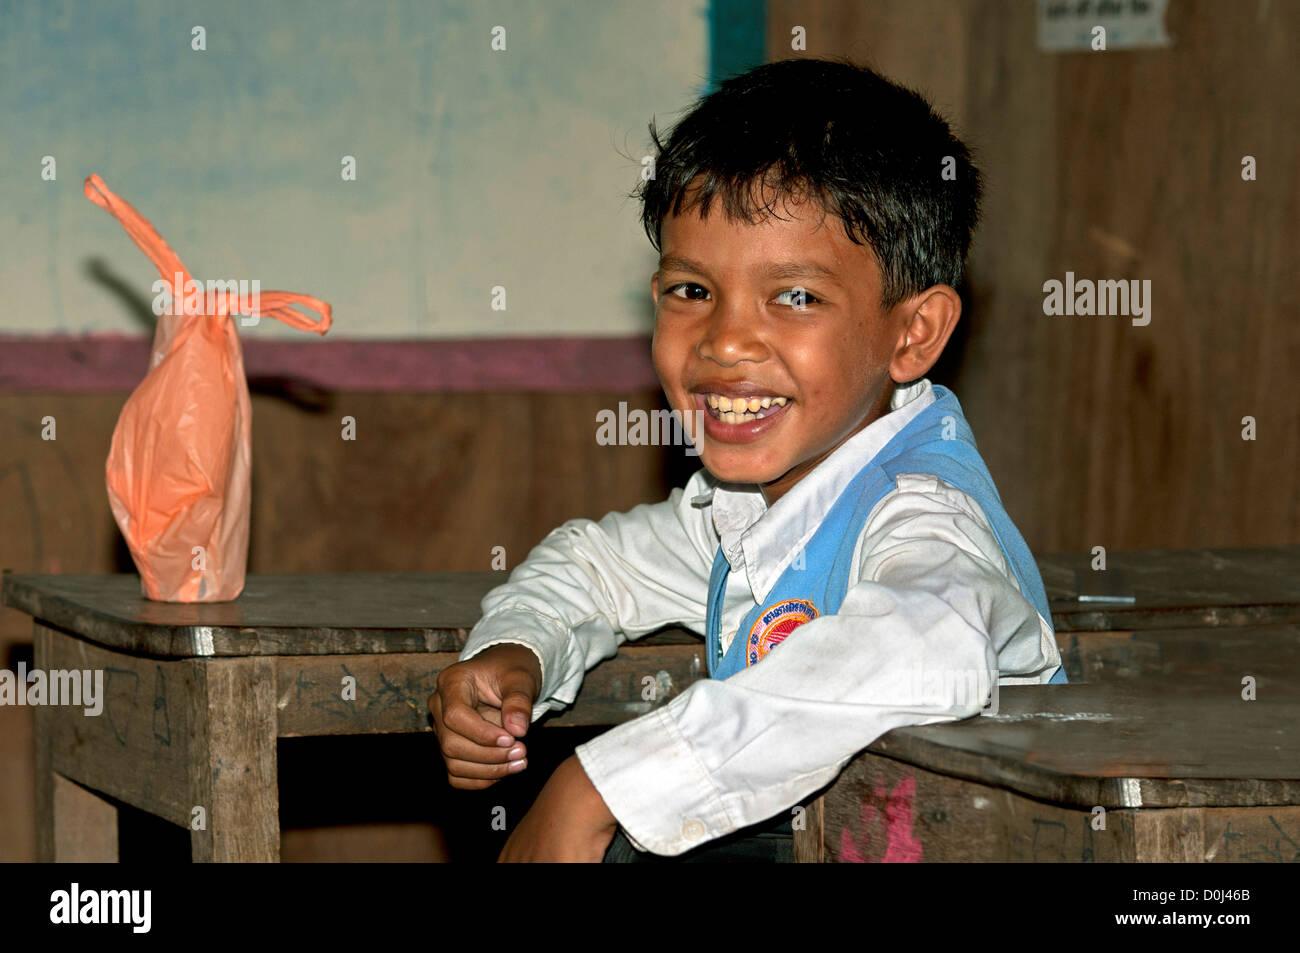 Primary school pupil dressed in school uniform at a school of Areyskat village near Phnom Penh, Cambodia - Stock Image